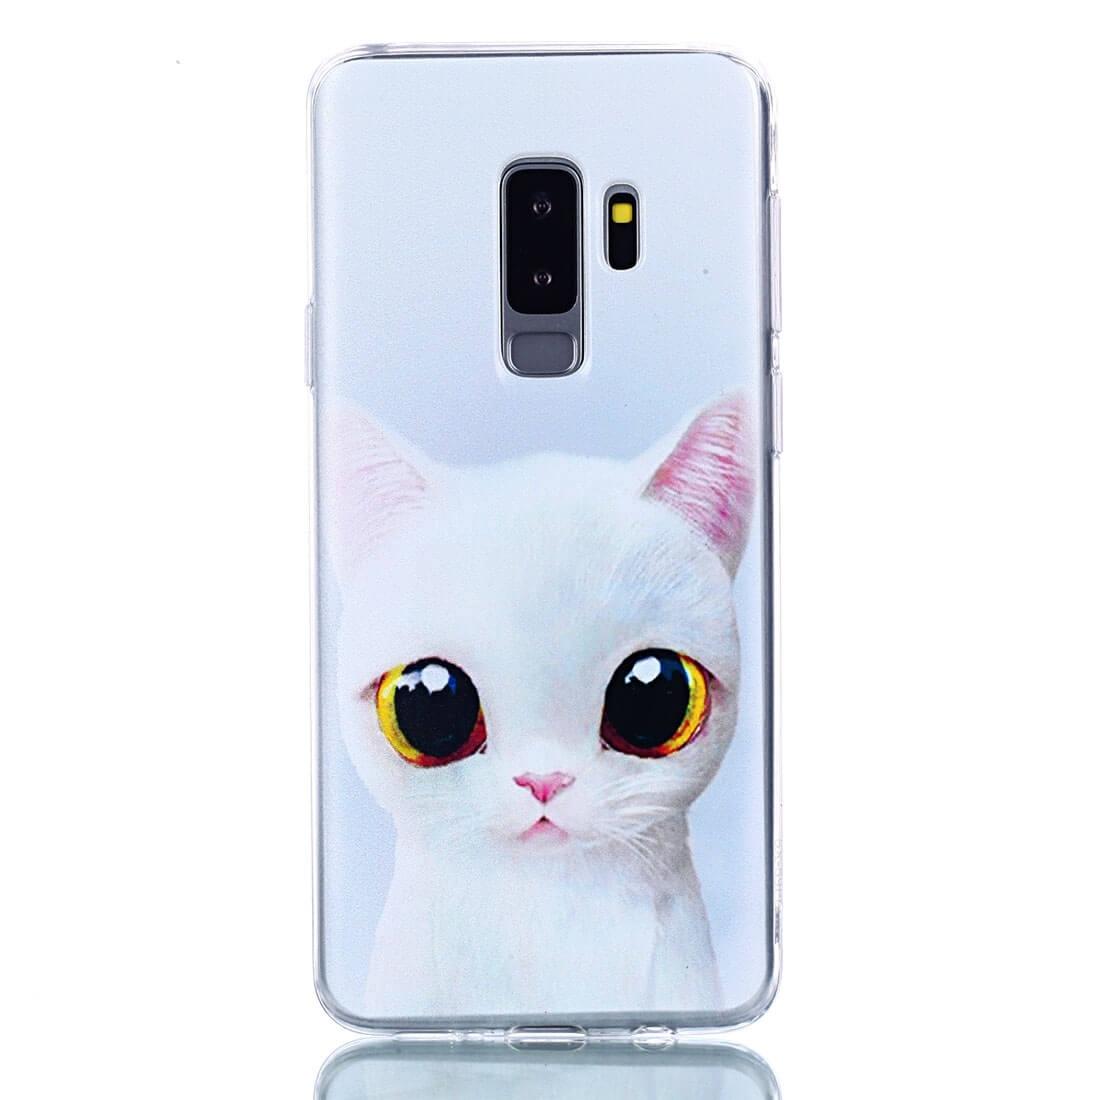 FORCELL ART Silikónový kryt Samsung Galaxy S9 Plus CAT